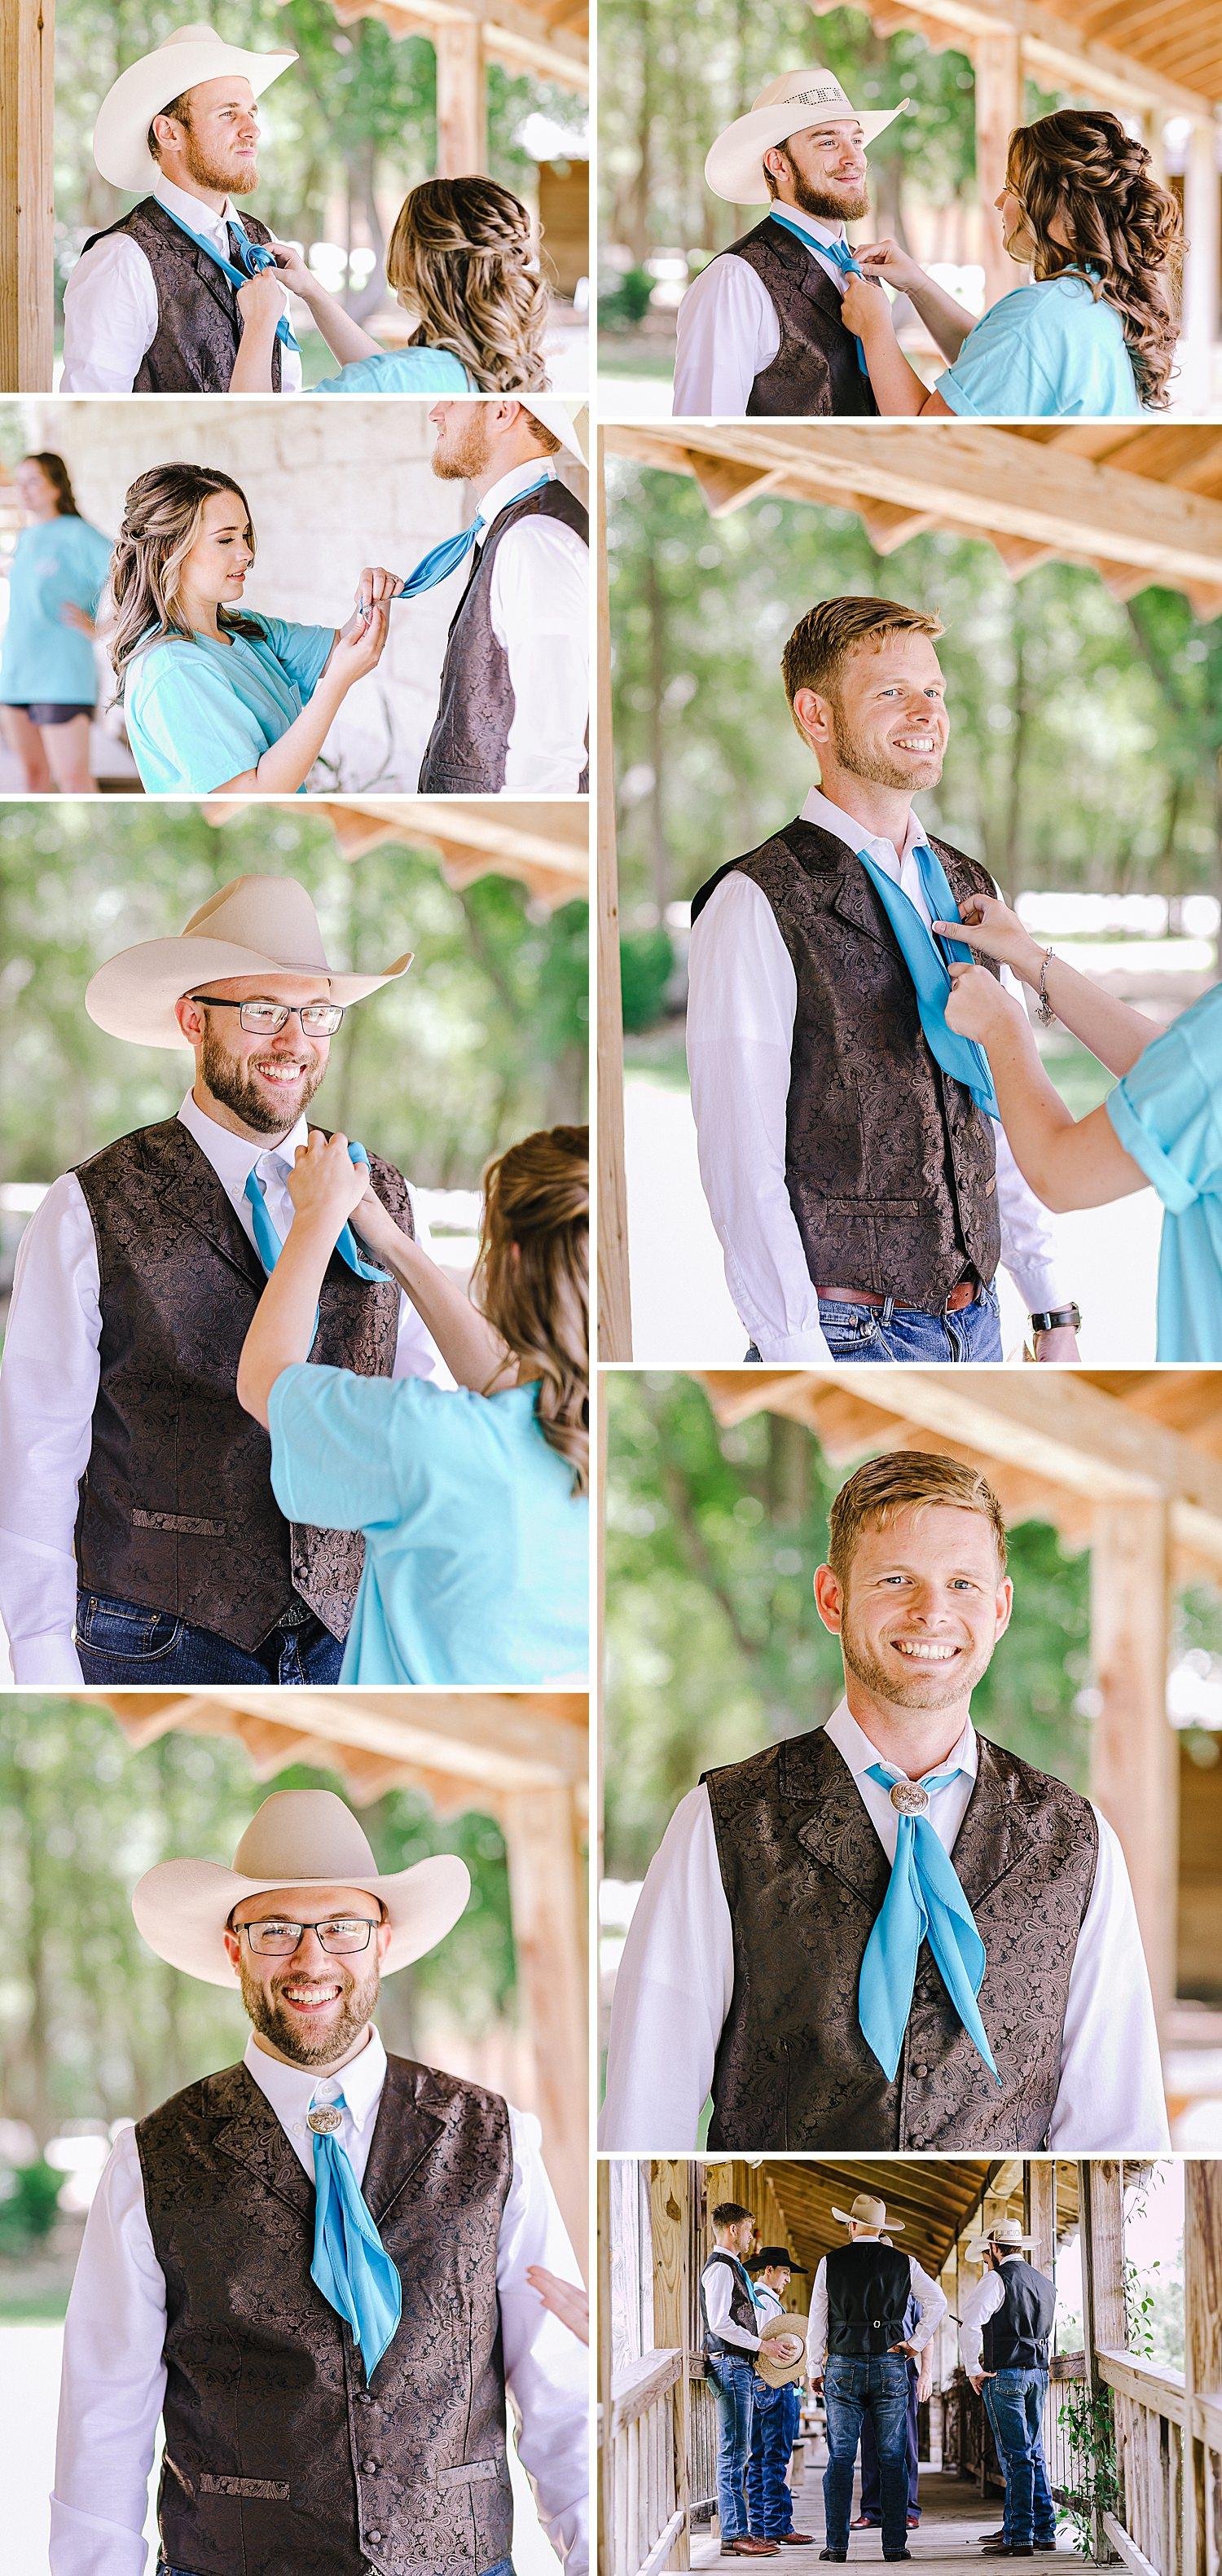 Carly-Barton-Photography-Old-Town-Texas-Rustic-Wedding-Photos-Sunflowers-Boots-Kyle-Texas_0008.jpg